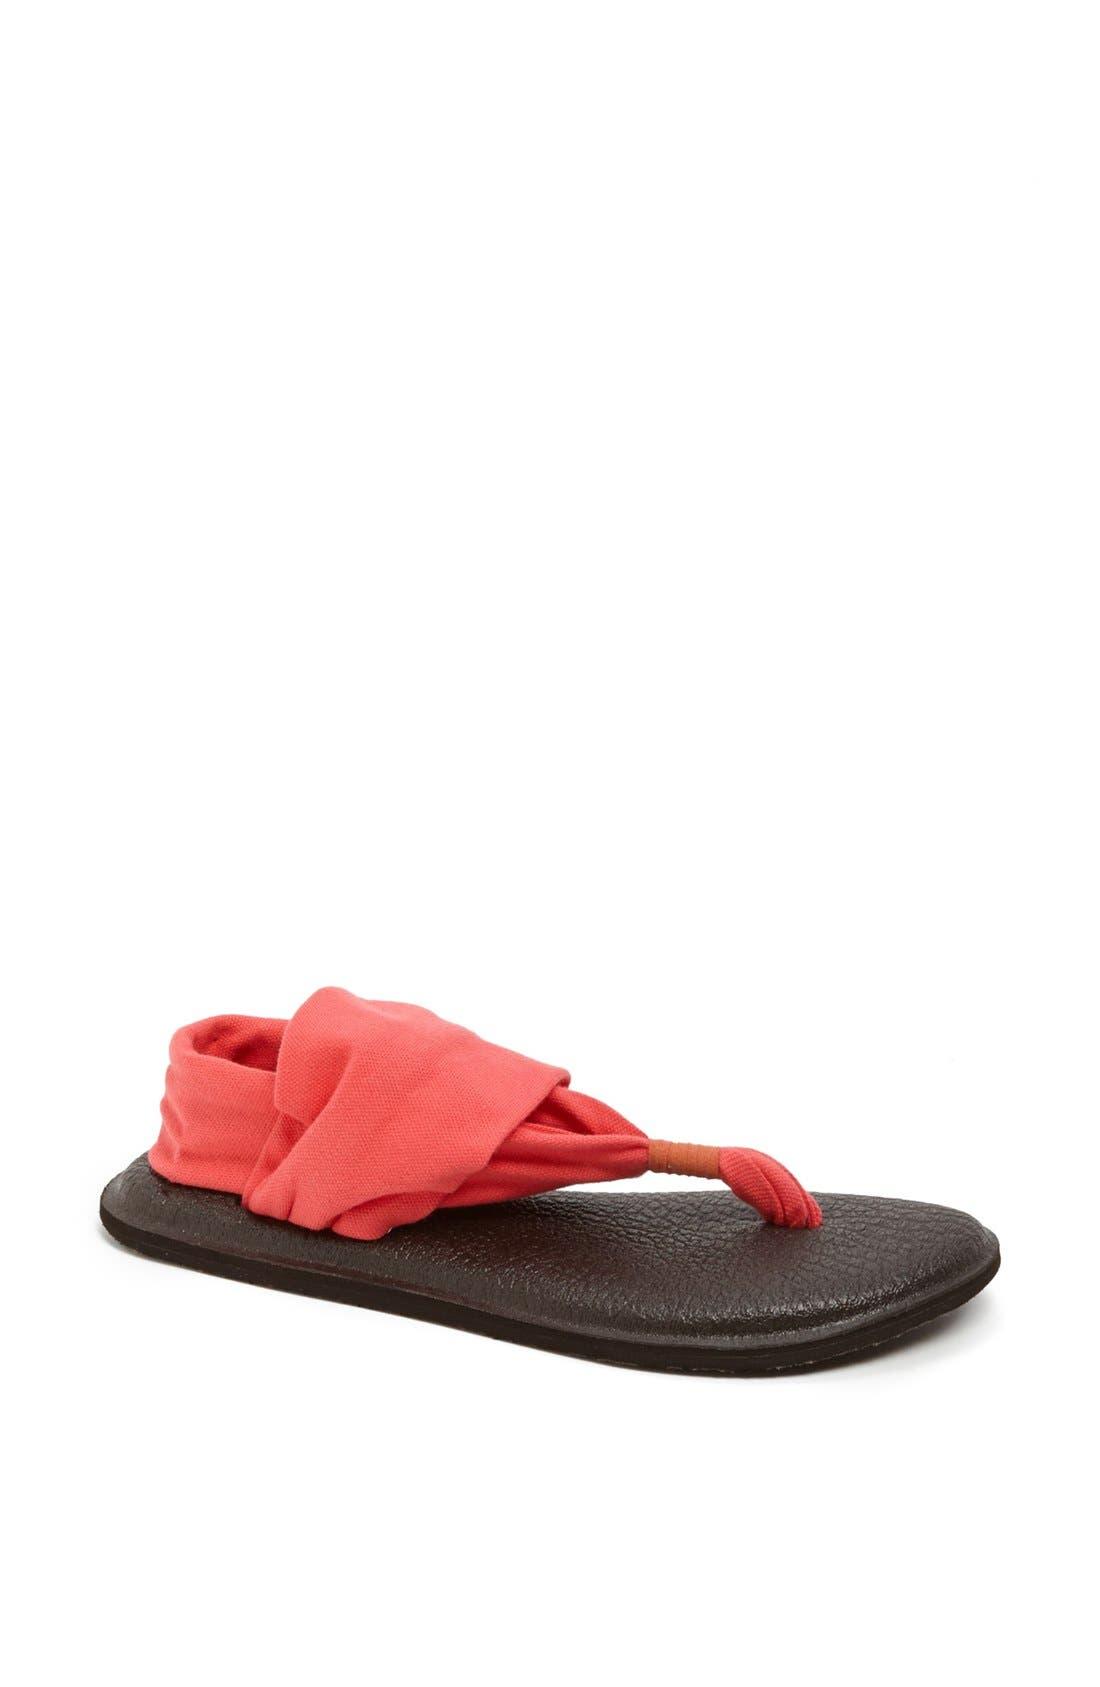 cac25b577 Sanuk  Yoga Sling 2  Sandal